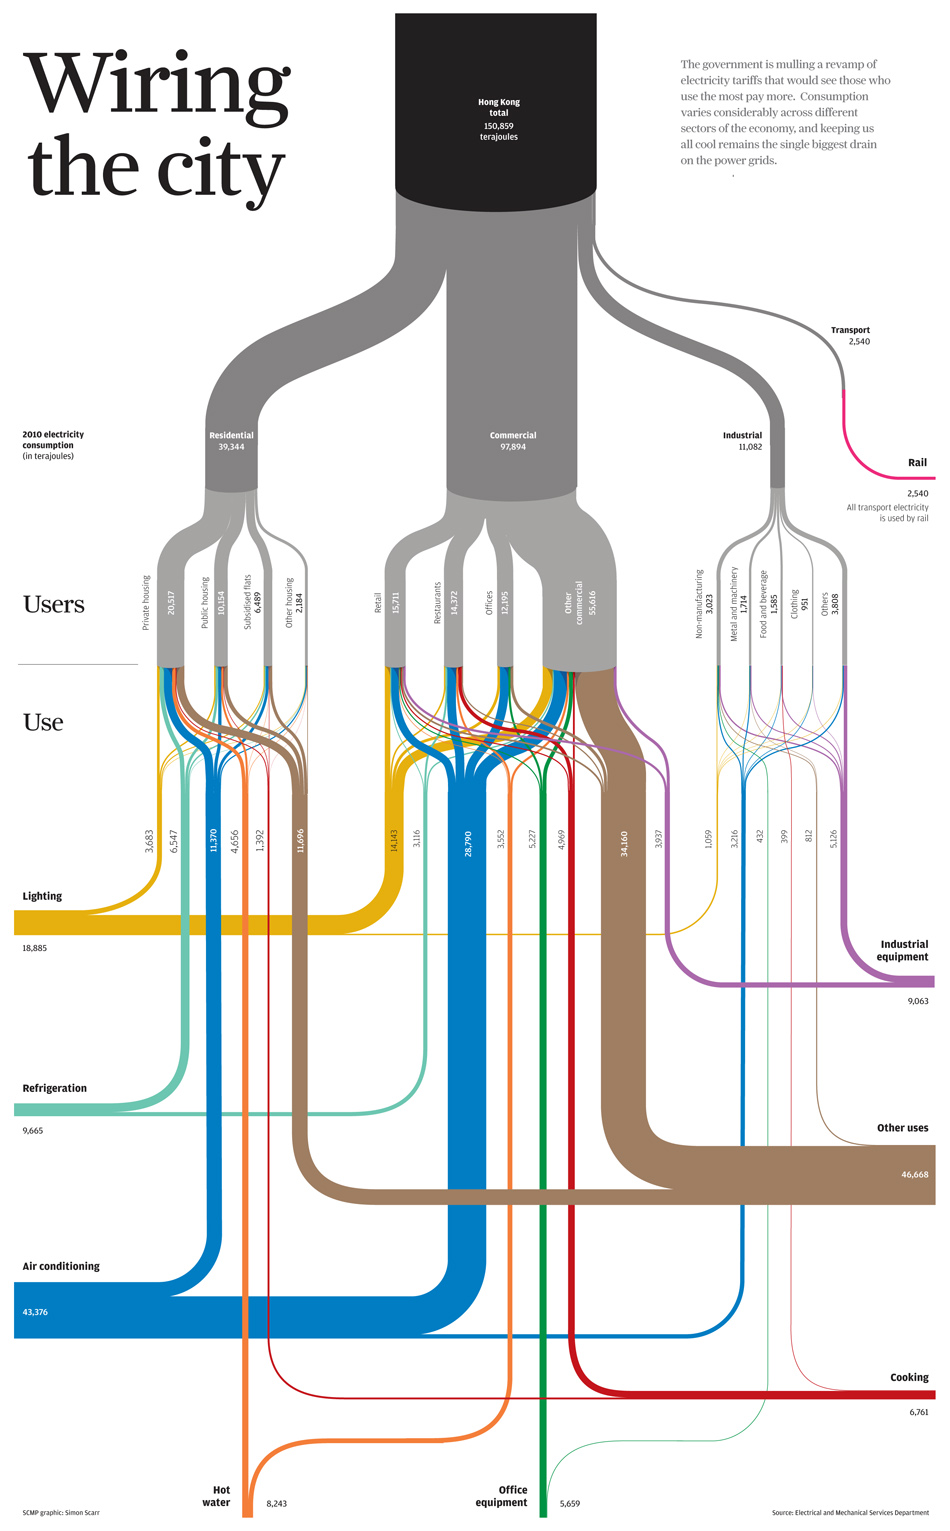 wiring_the_city sopa 2013 award wiring the city sankey diagrams  at cita.asia